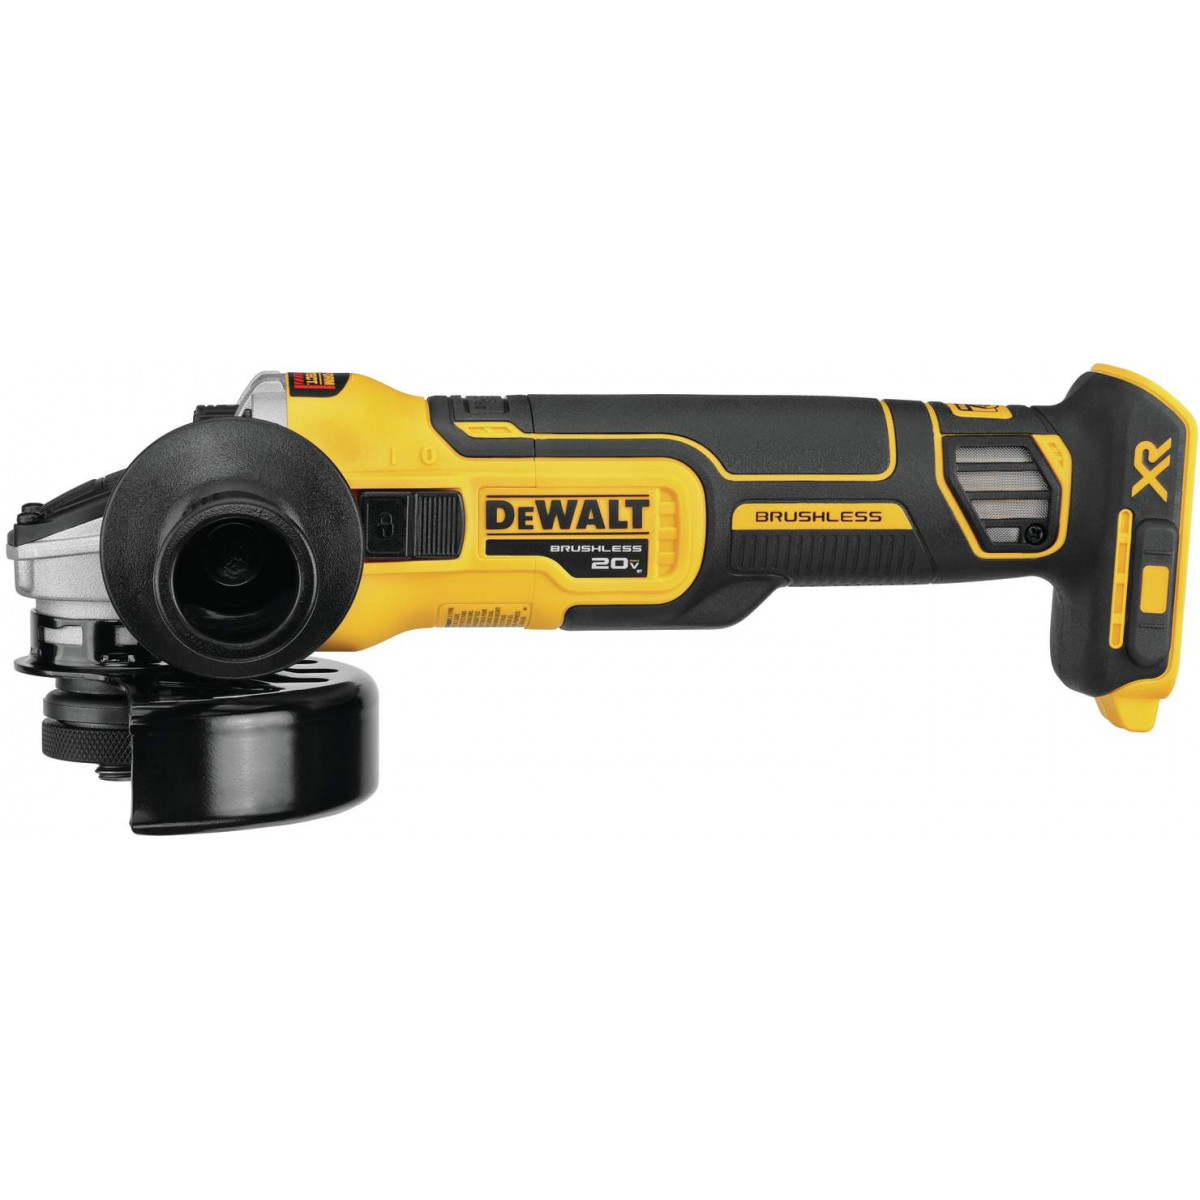 DeWALT DCG405B 20V 4 -1/2In Slide Switch Small Angle Grinder With Kickback Brake (Tool Only)